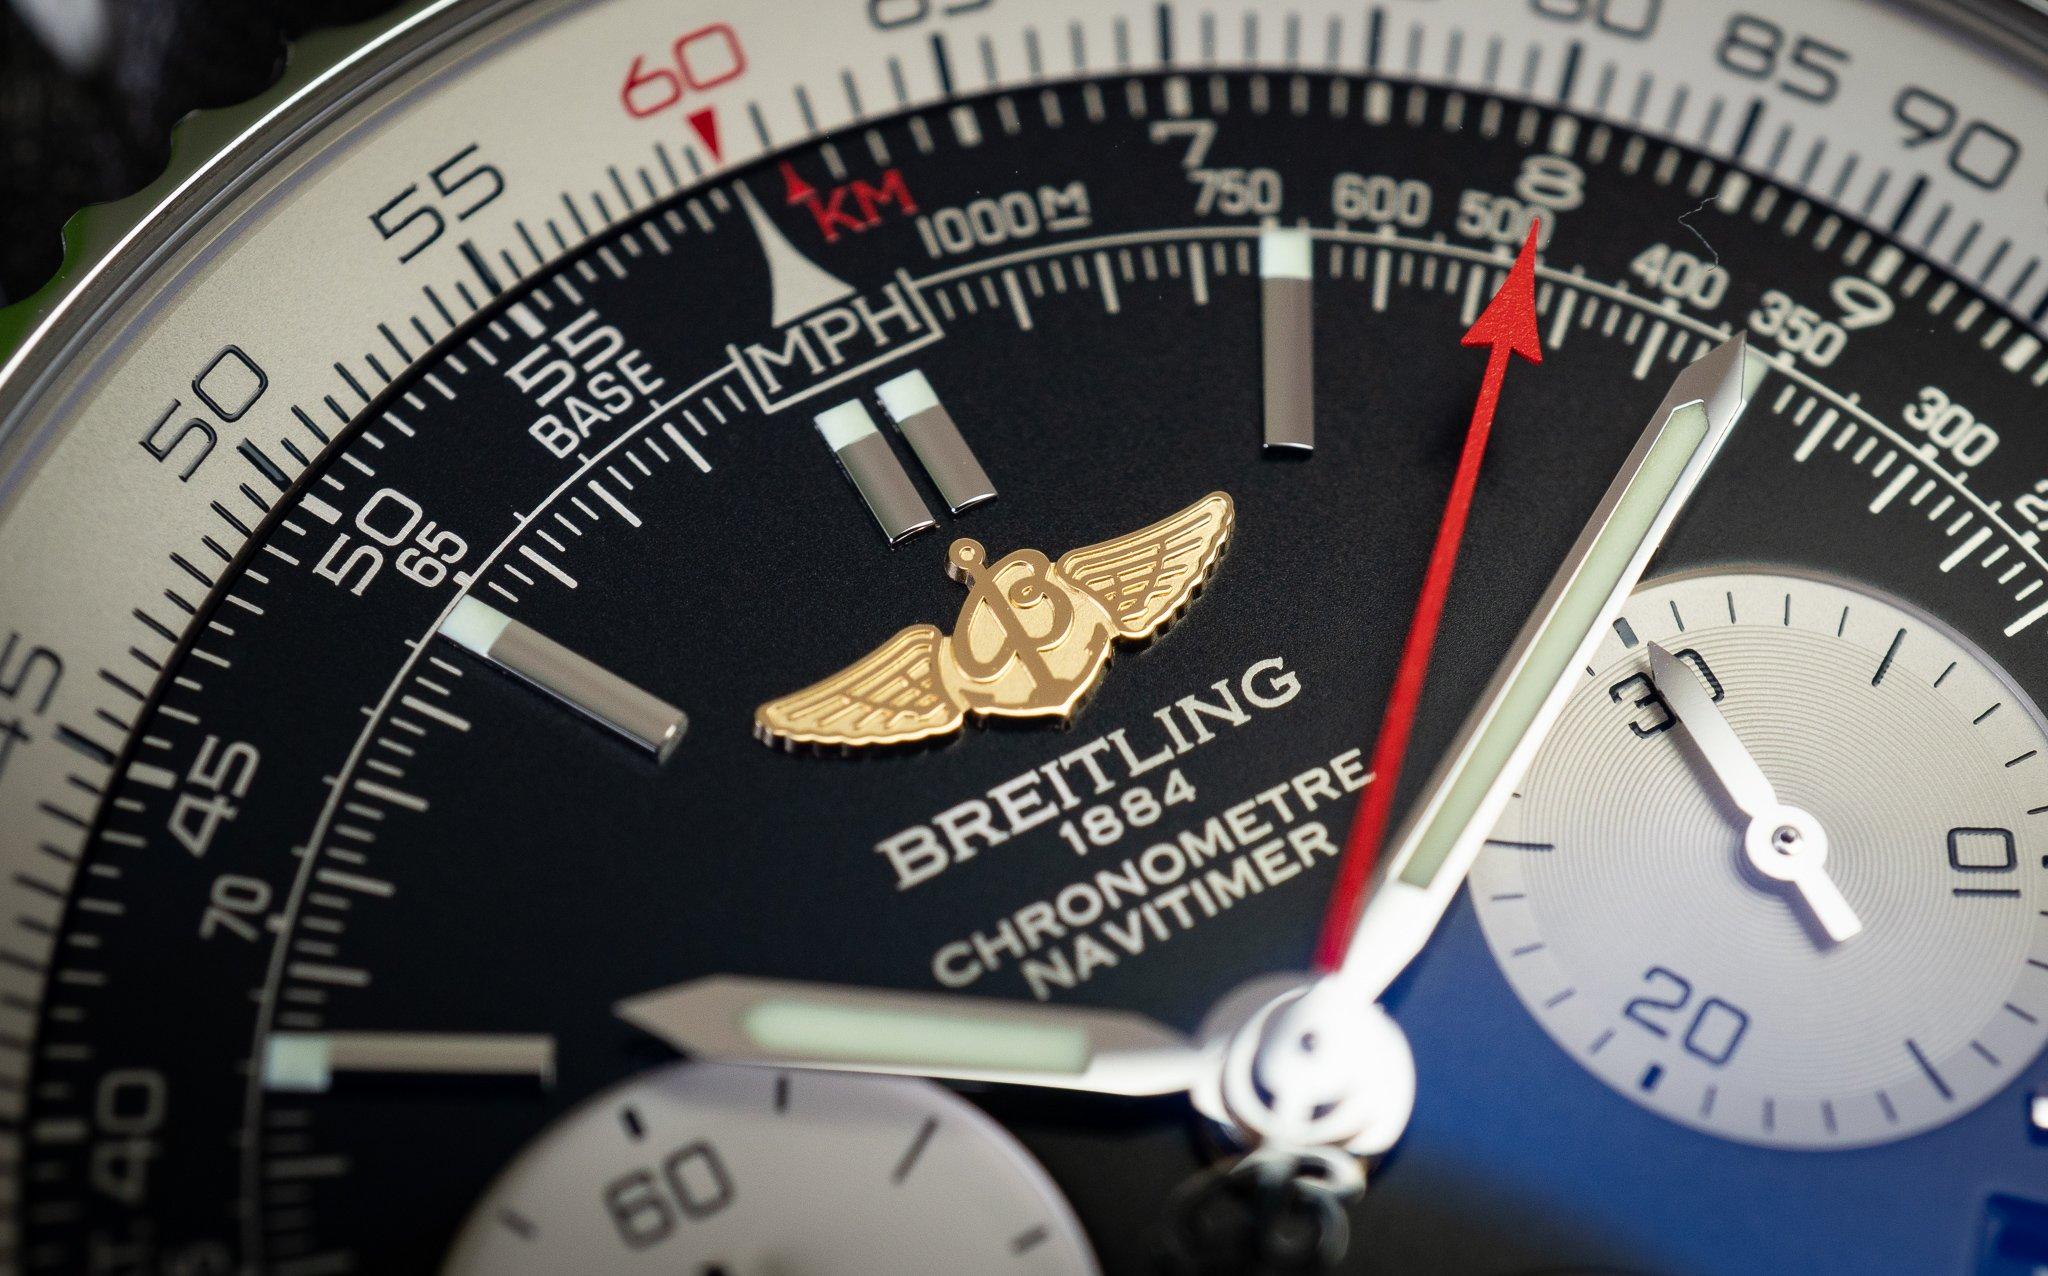 Breitling Navitimer Outletcity Metzingen appliziertes Logo mit Flügeln